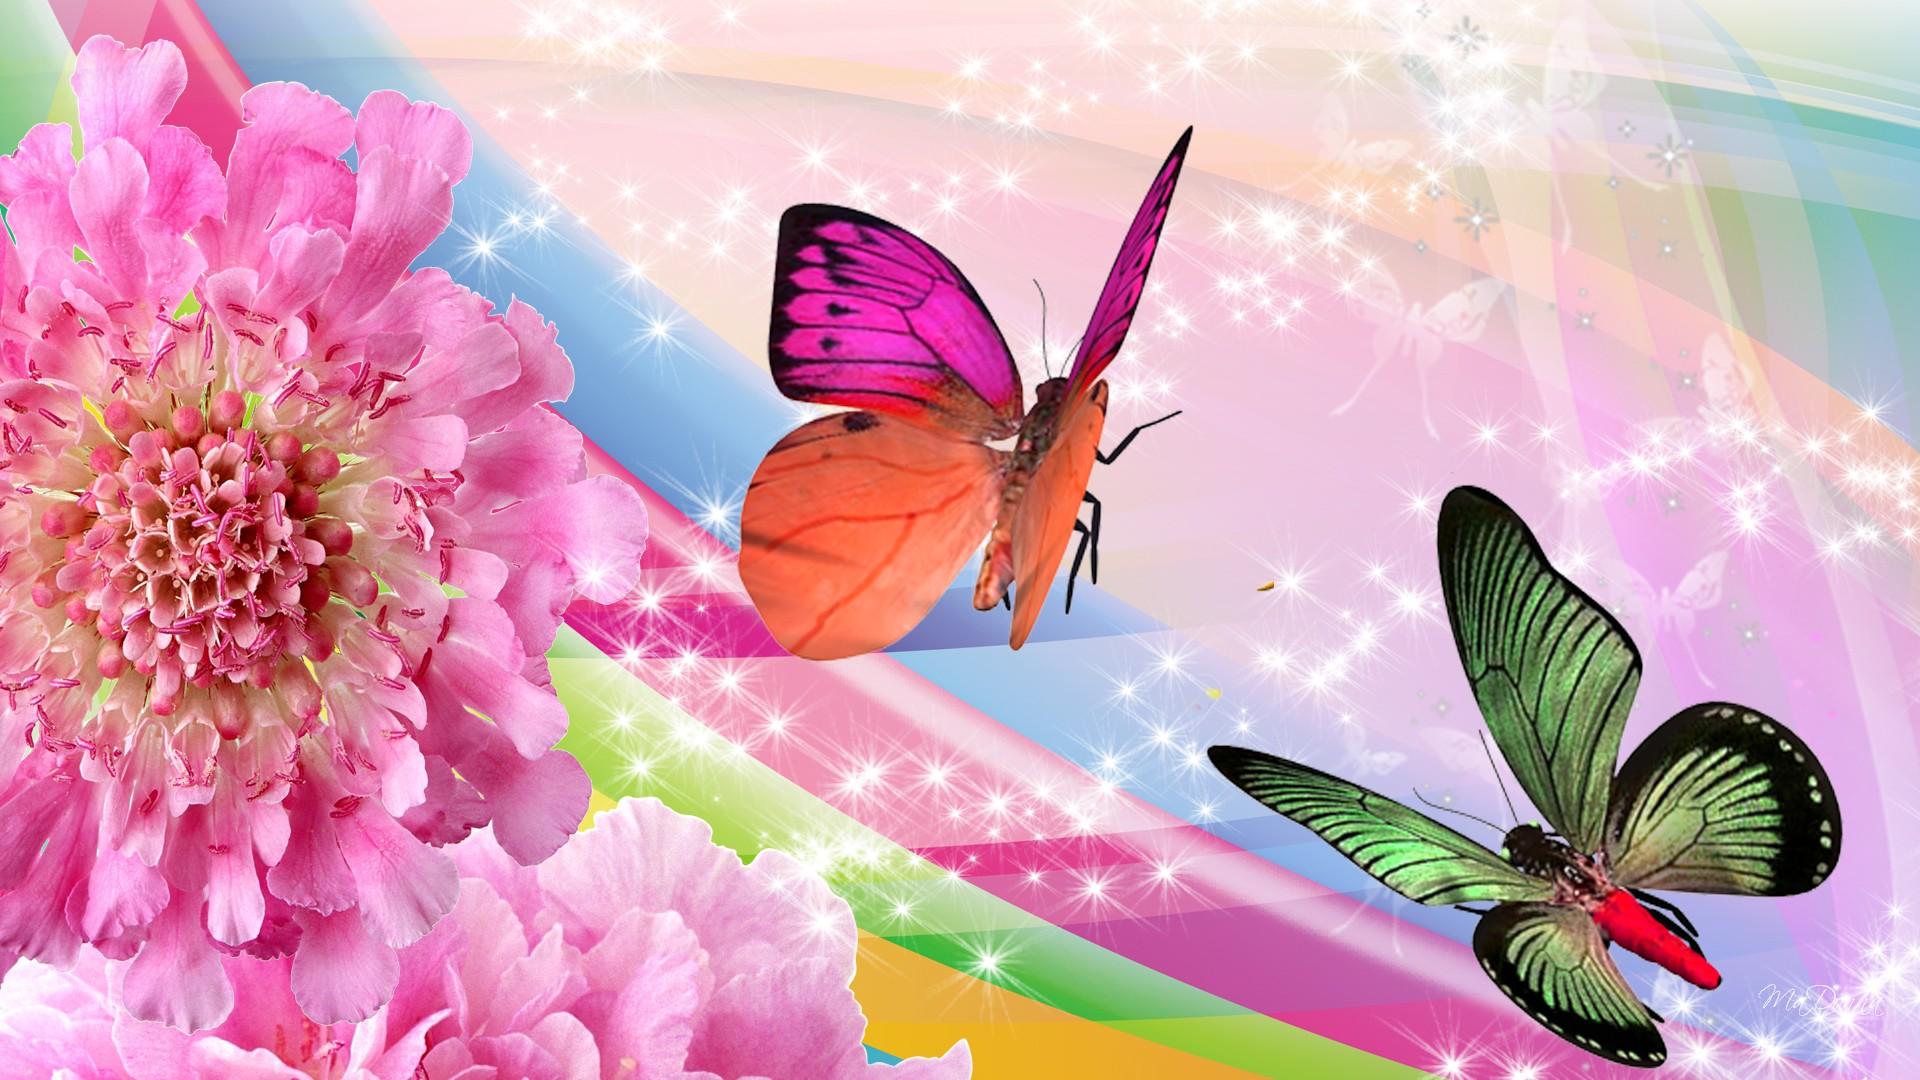 Butterflies And Flowers Wallpaper   52DazheW Gallery 1920x1080